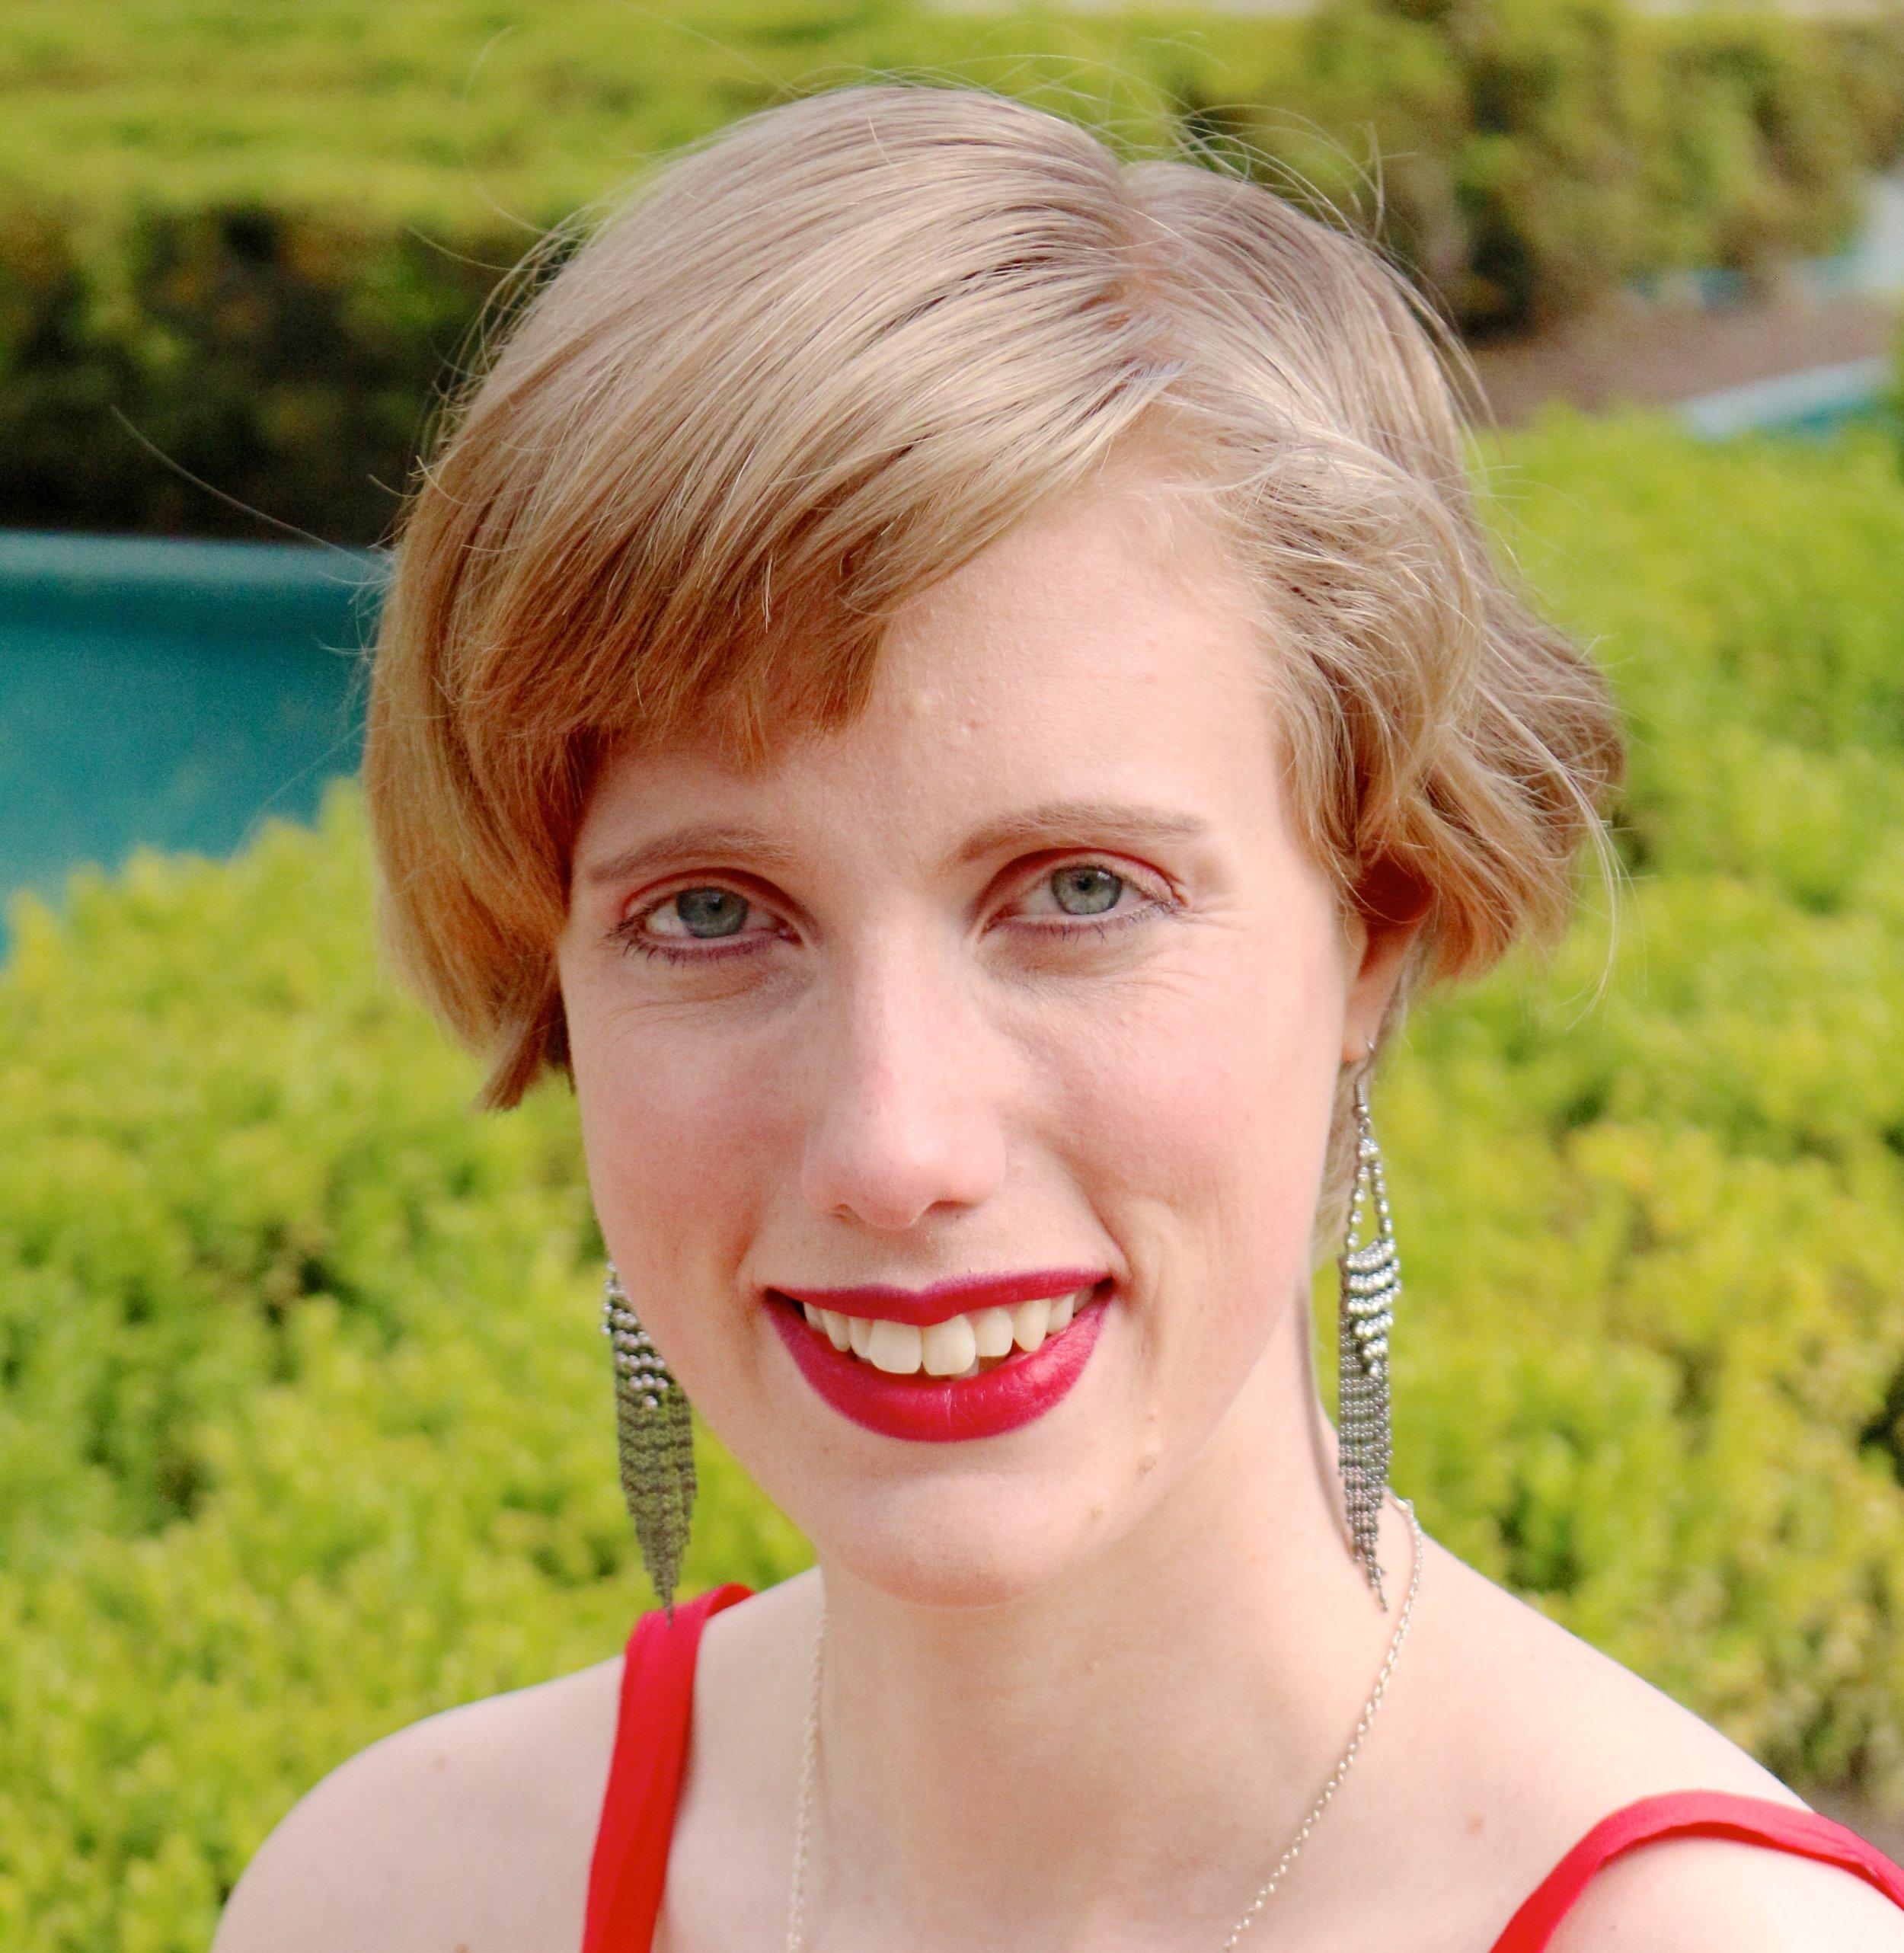 Cecily Shaw Headshot.jpg